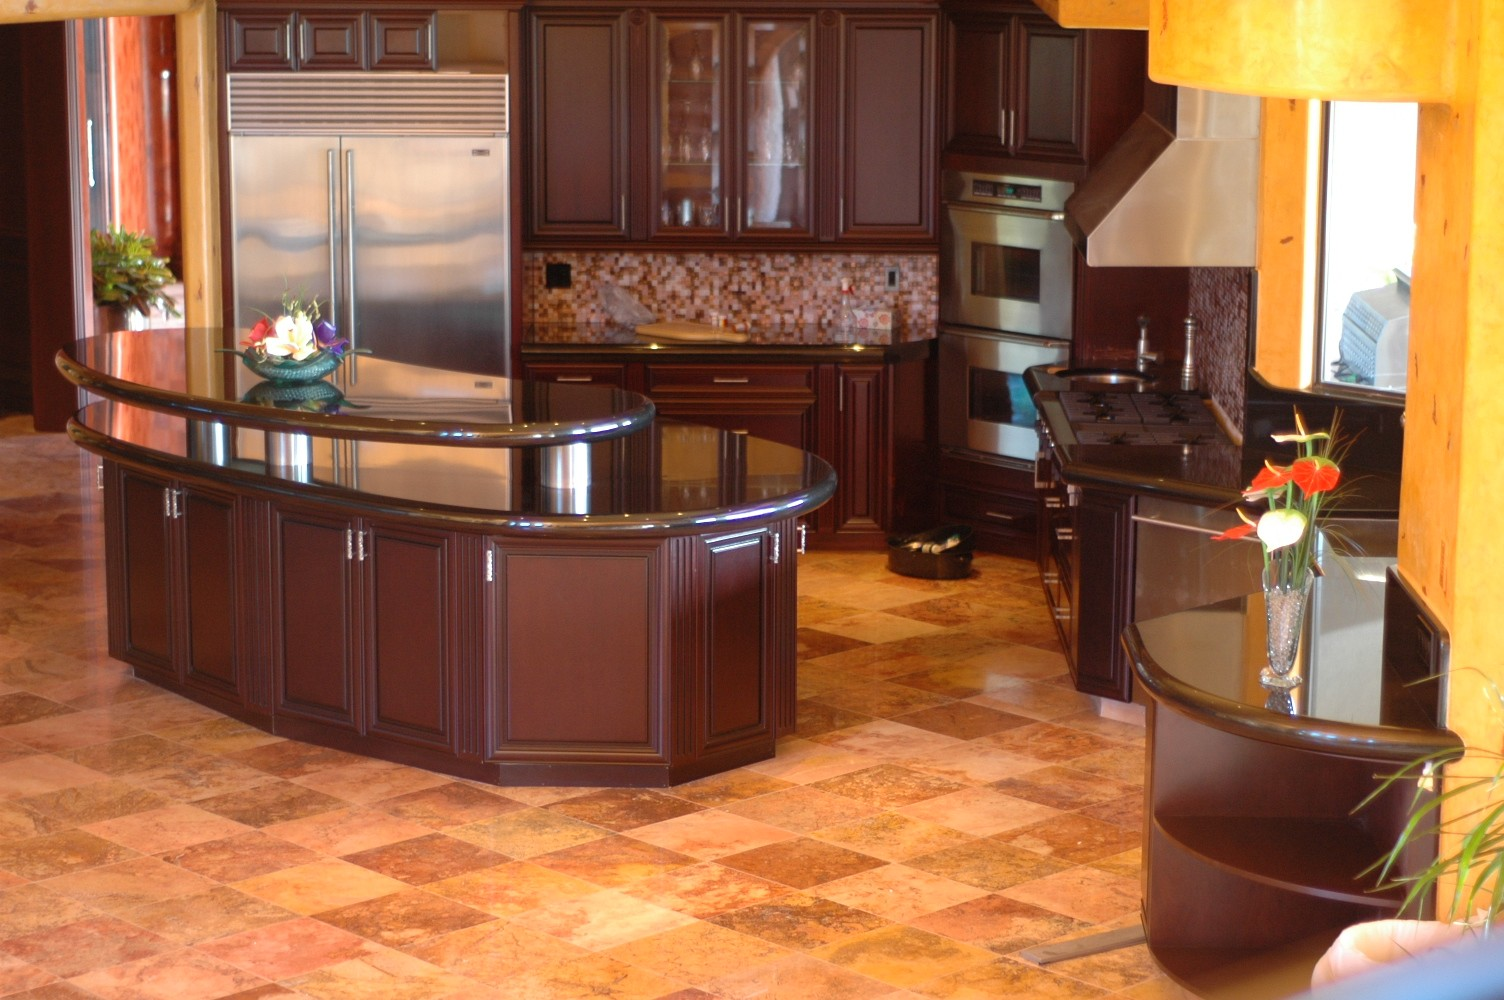 granite kitchen designs pictures photo - 6